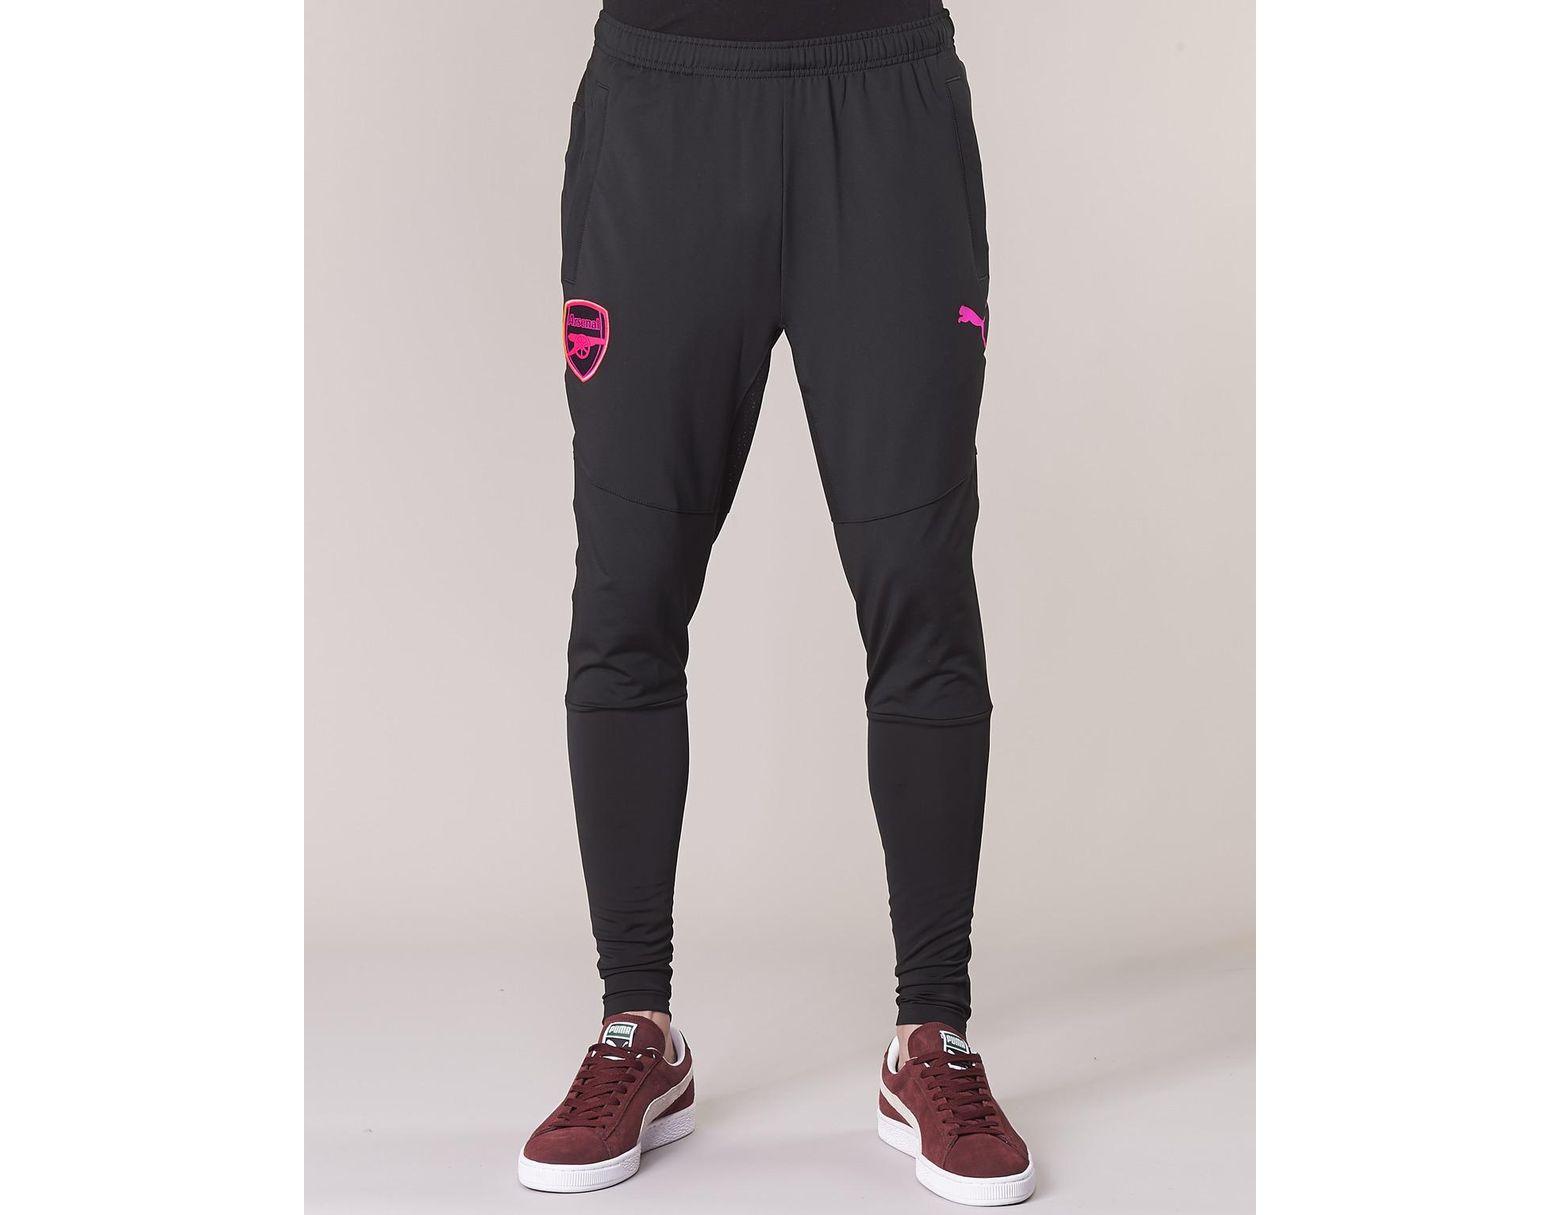 6decd0d60 PUMA Arsenal Fc Stadium Pant Sportswear in Black for Men - Lyst